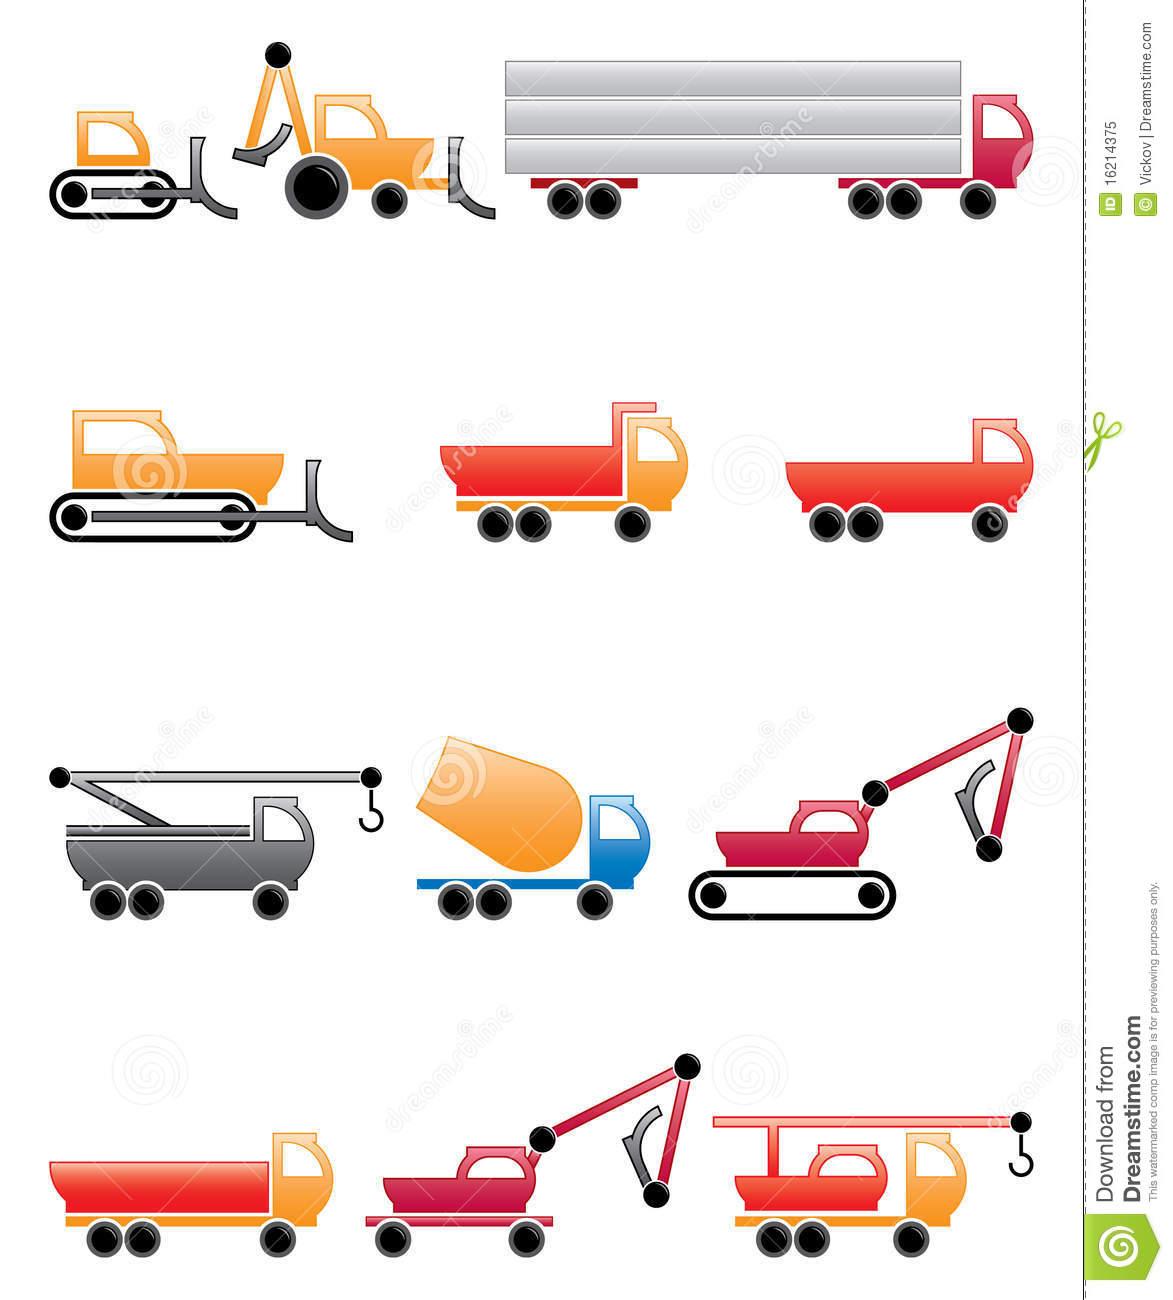 Construction Vehicles Royalty Free Stock Photo.